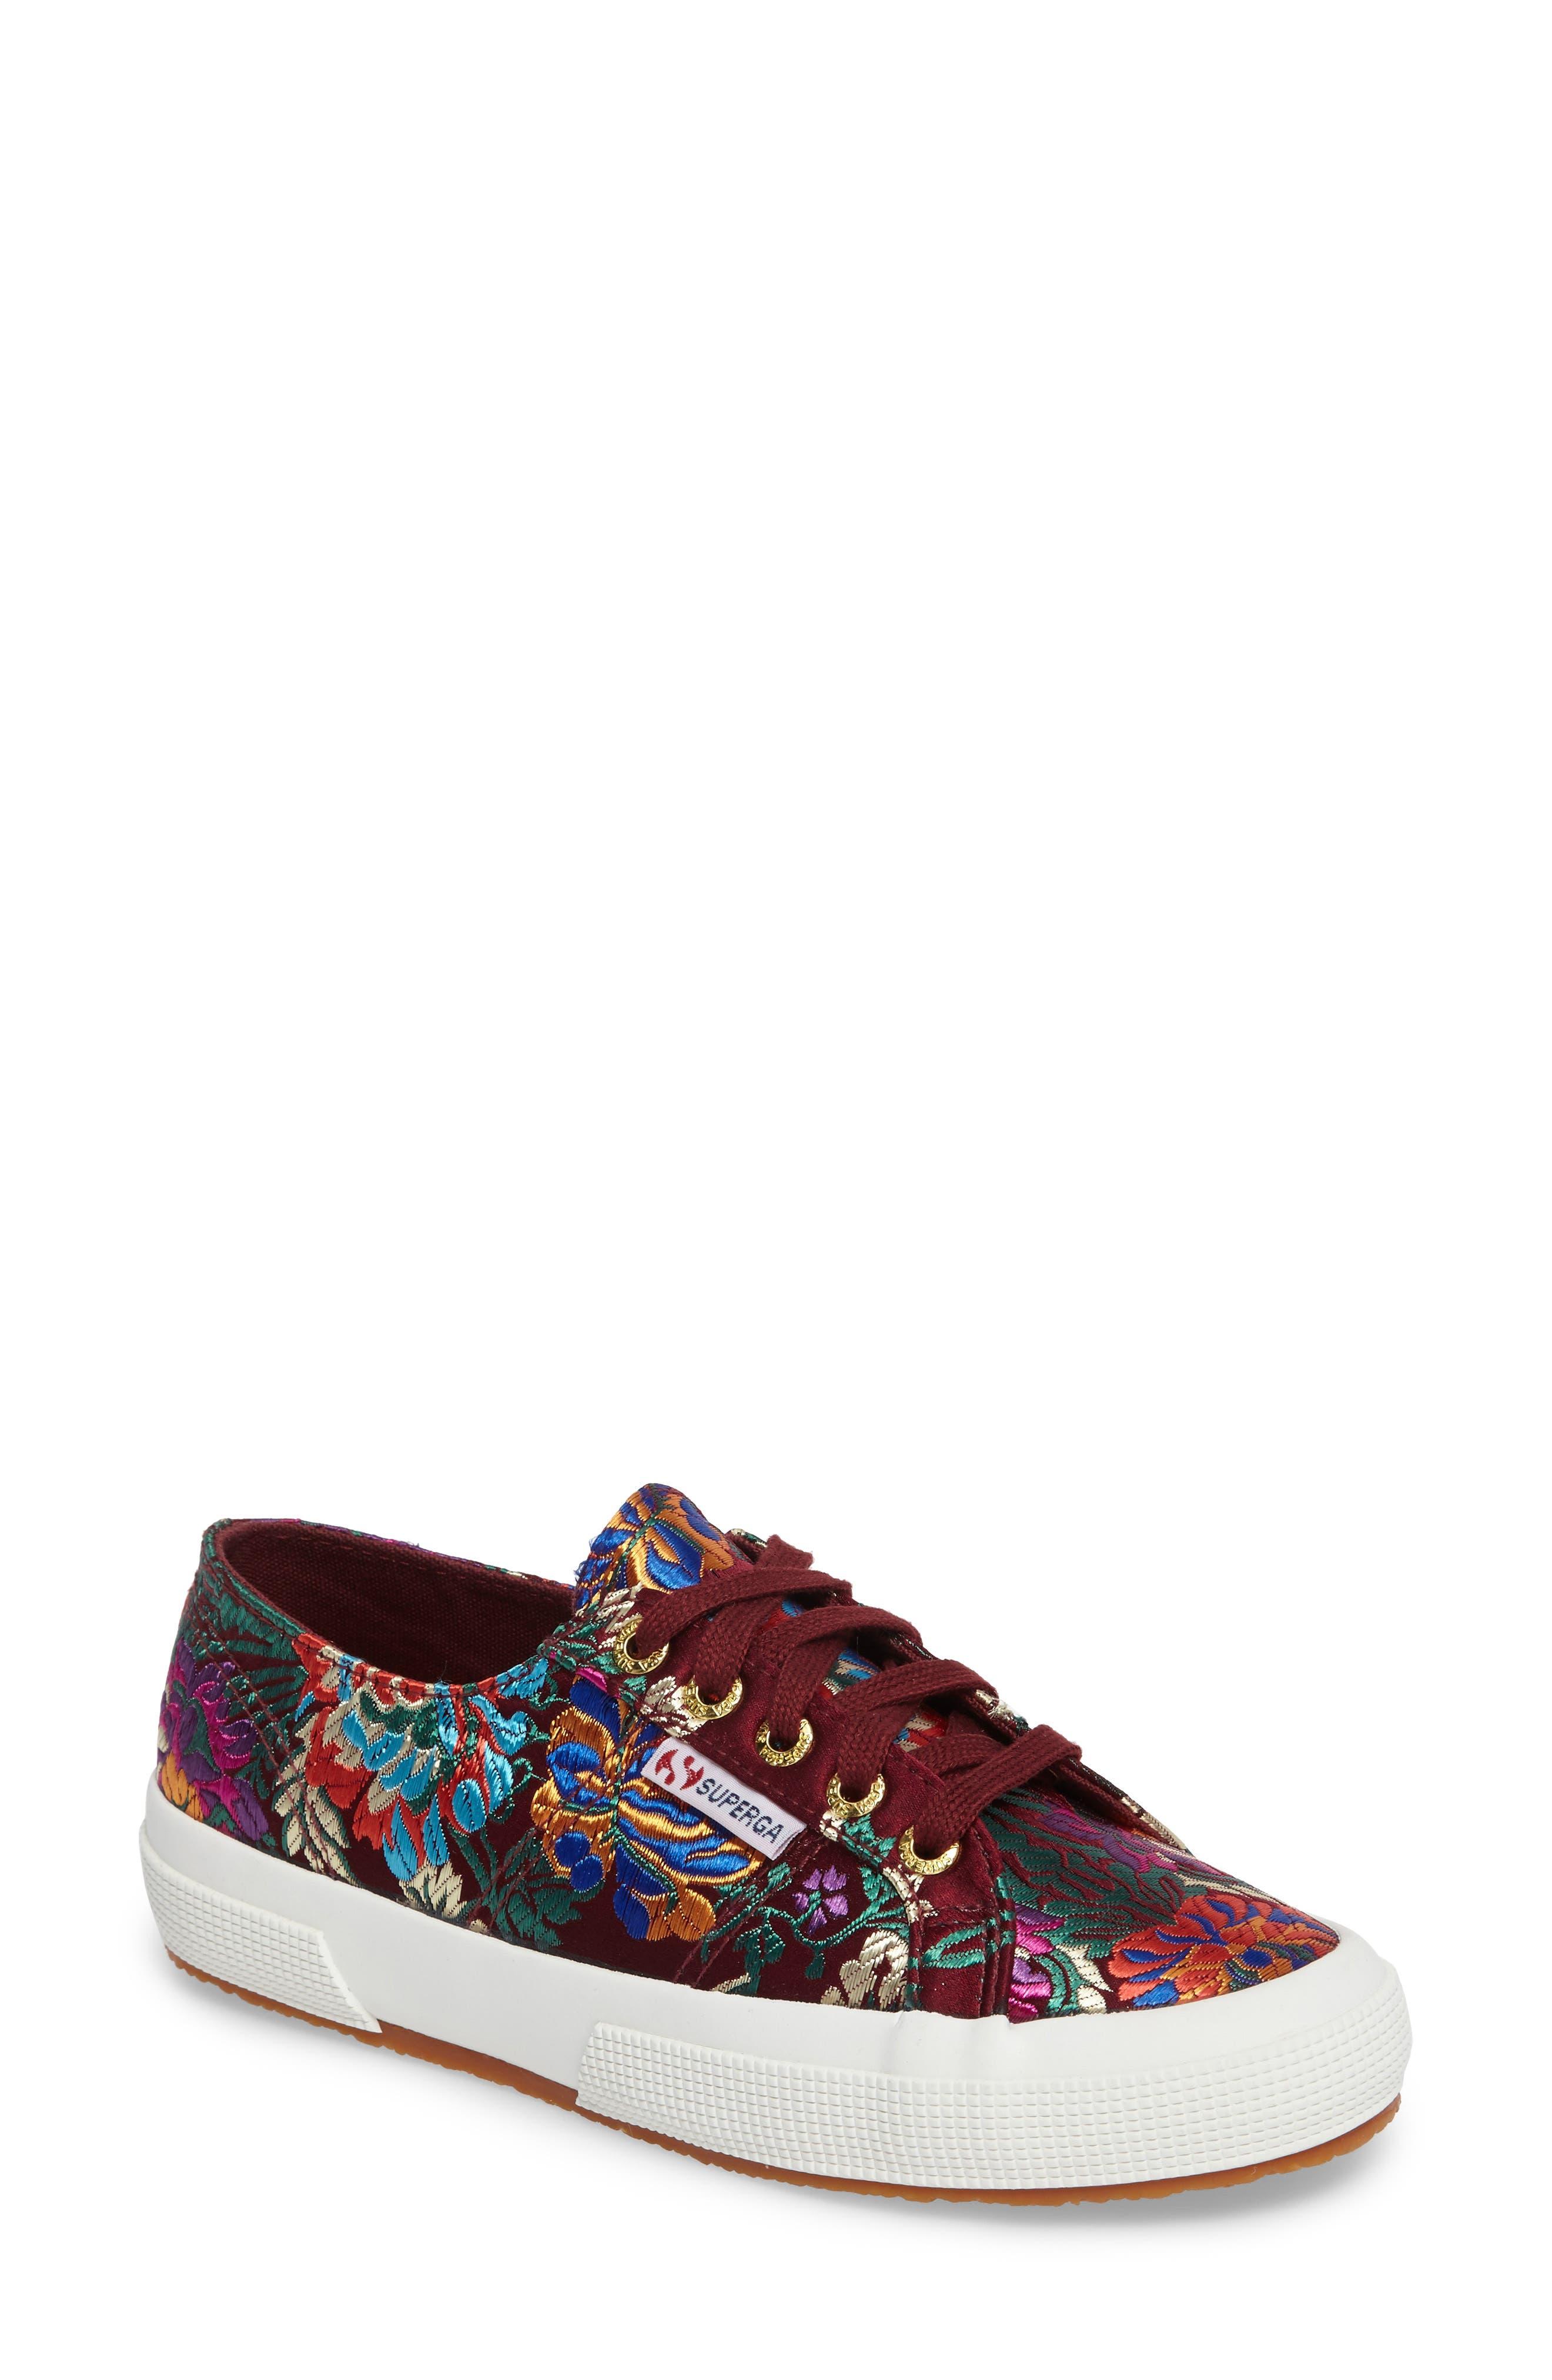 SUPERGA 2750 Embroidered Sneaker